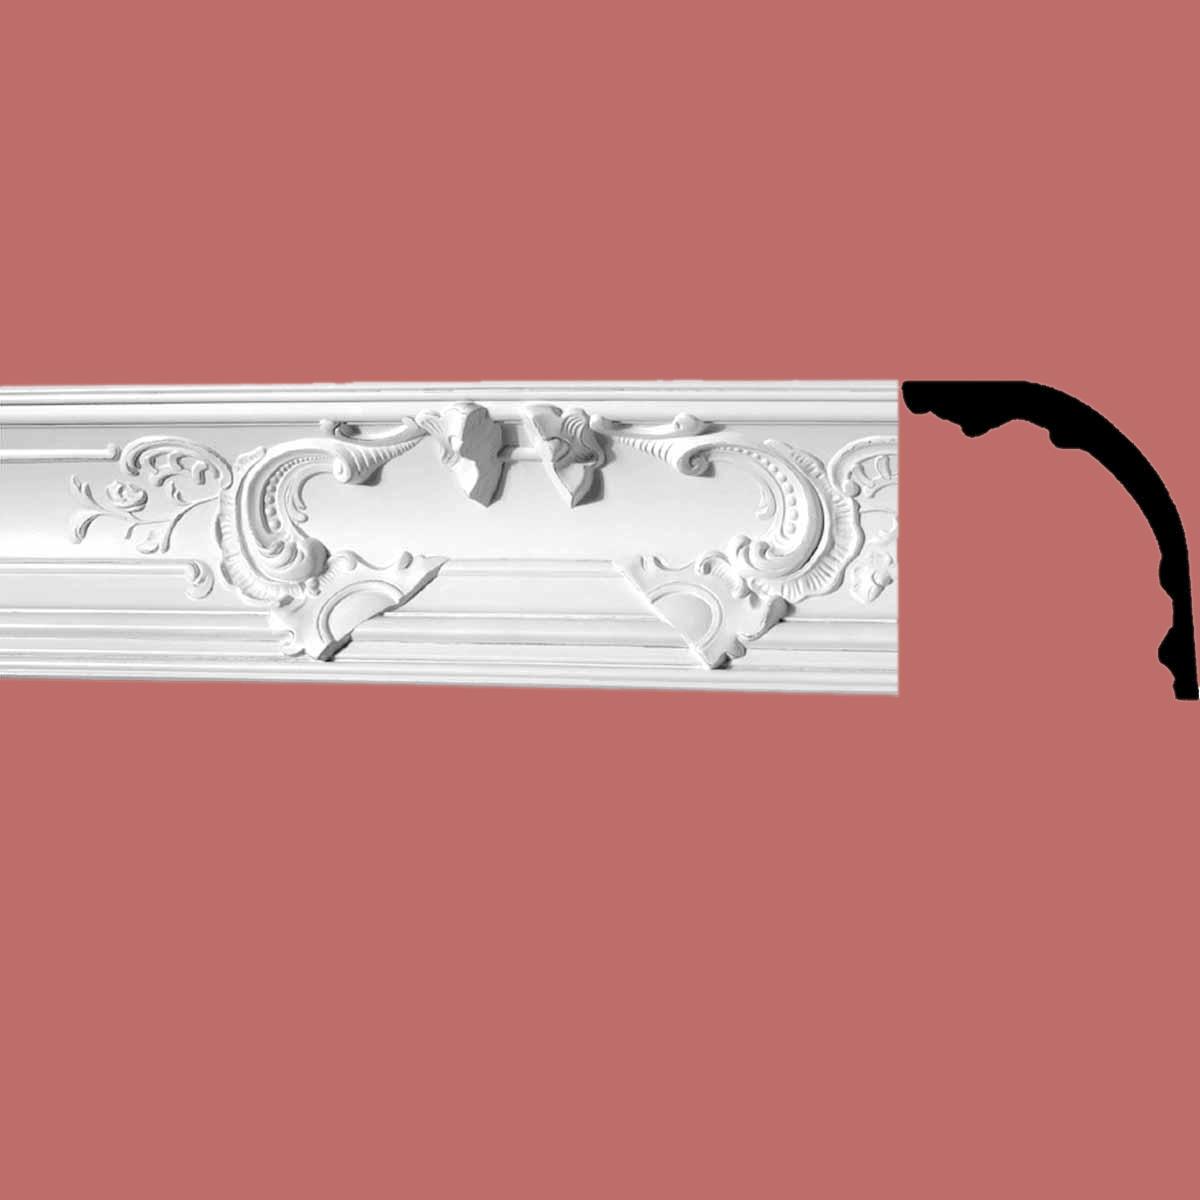 Cornice White Urethane Sample of 2079216.5 Long Cornice Cornice Moulding Cornice Molding